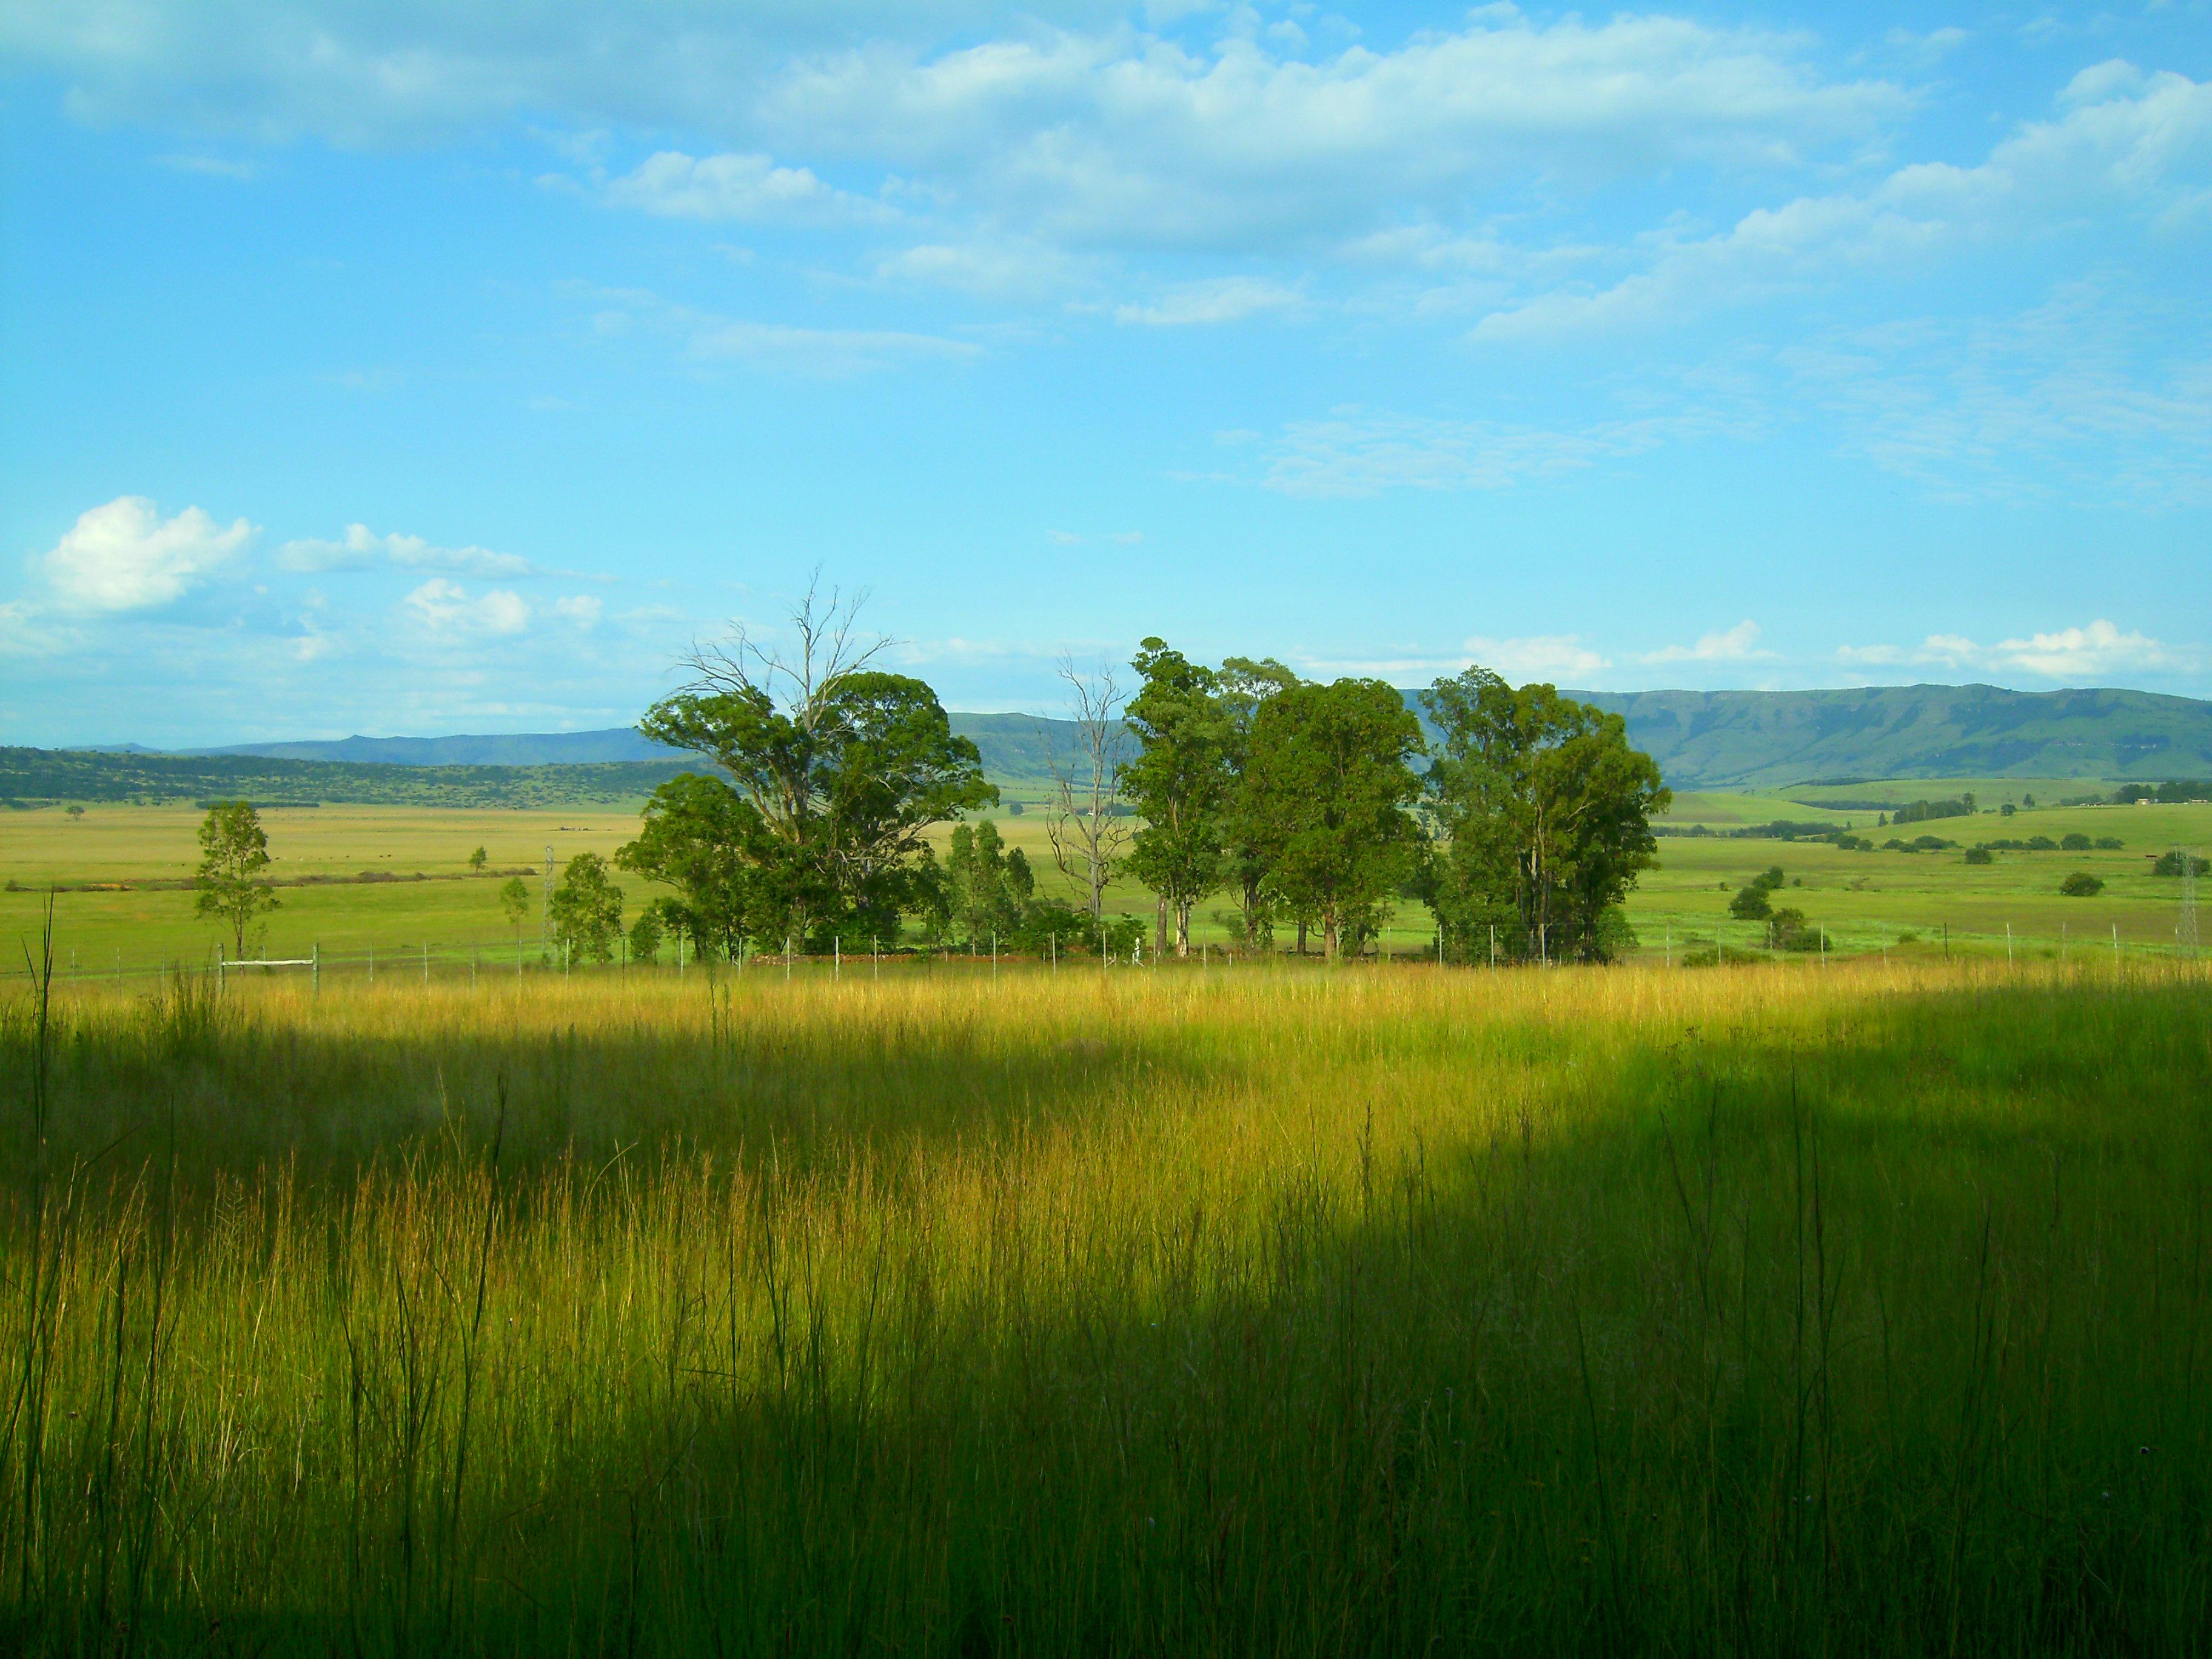 Guma iz Južne Afrike